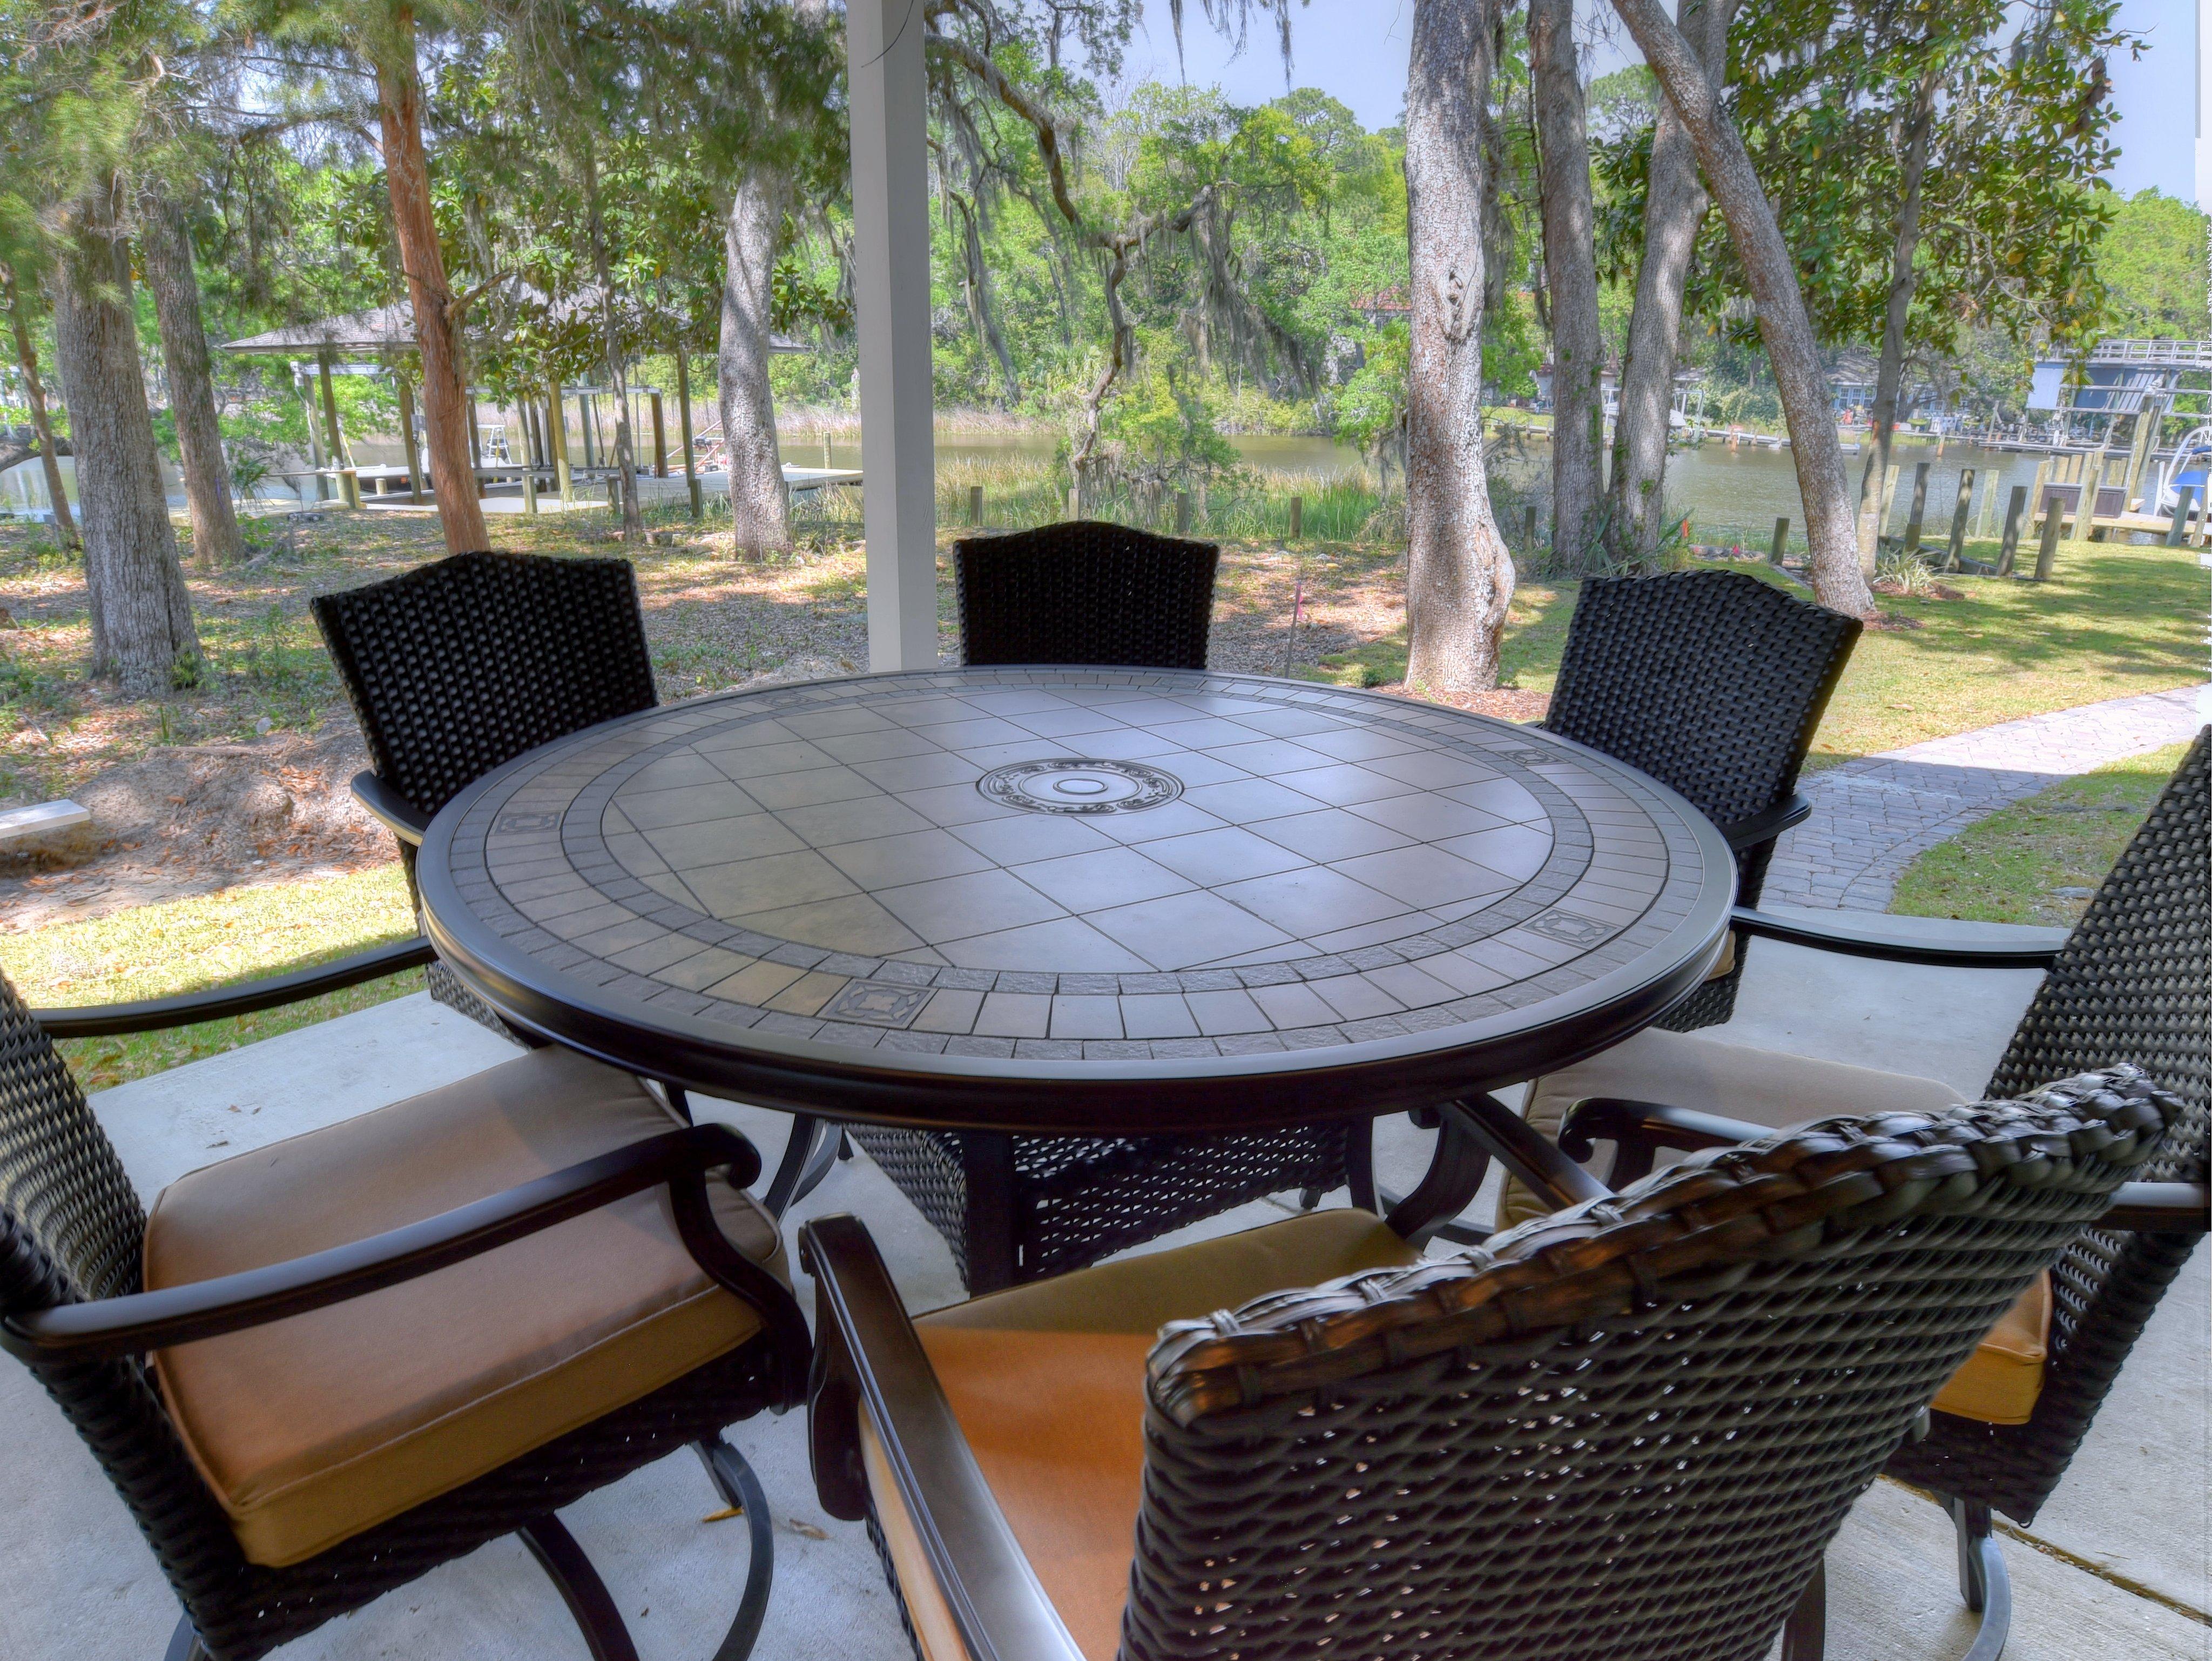 93 Beacon Point Condo rental in Sandestin Rentals ~ Cottages and Villas  in Destin Florida - #6